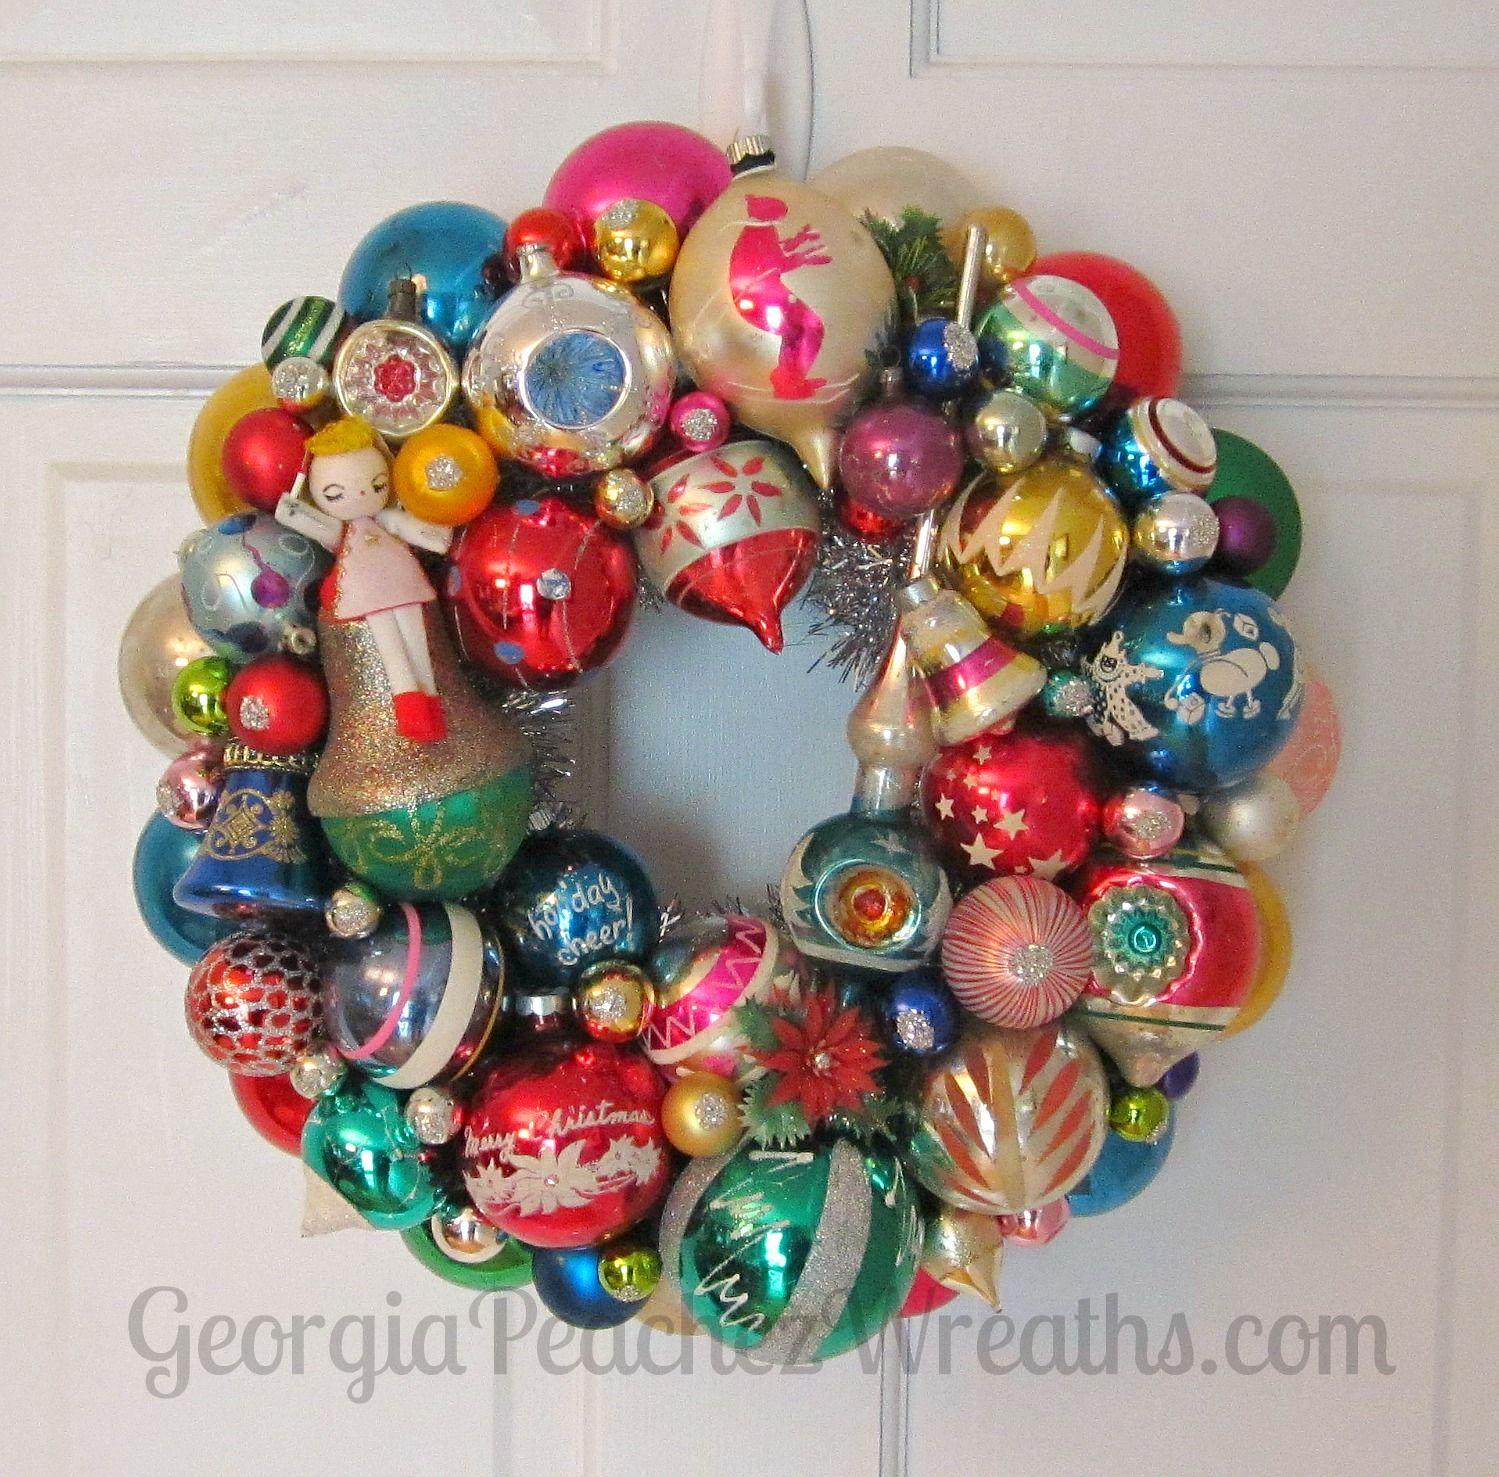 Georgiapeachezwreaths Com Vintage Christmas Ornaments Vintage Ornament Wreath Vintage Christmas Crafts